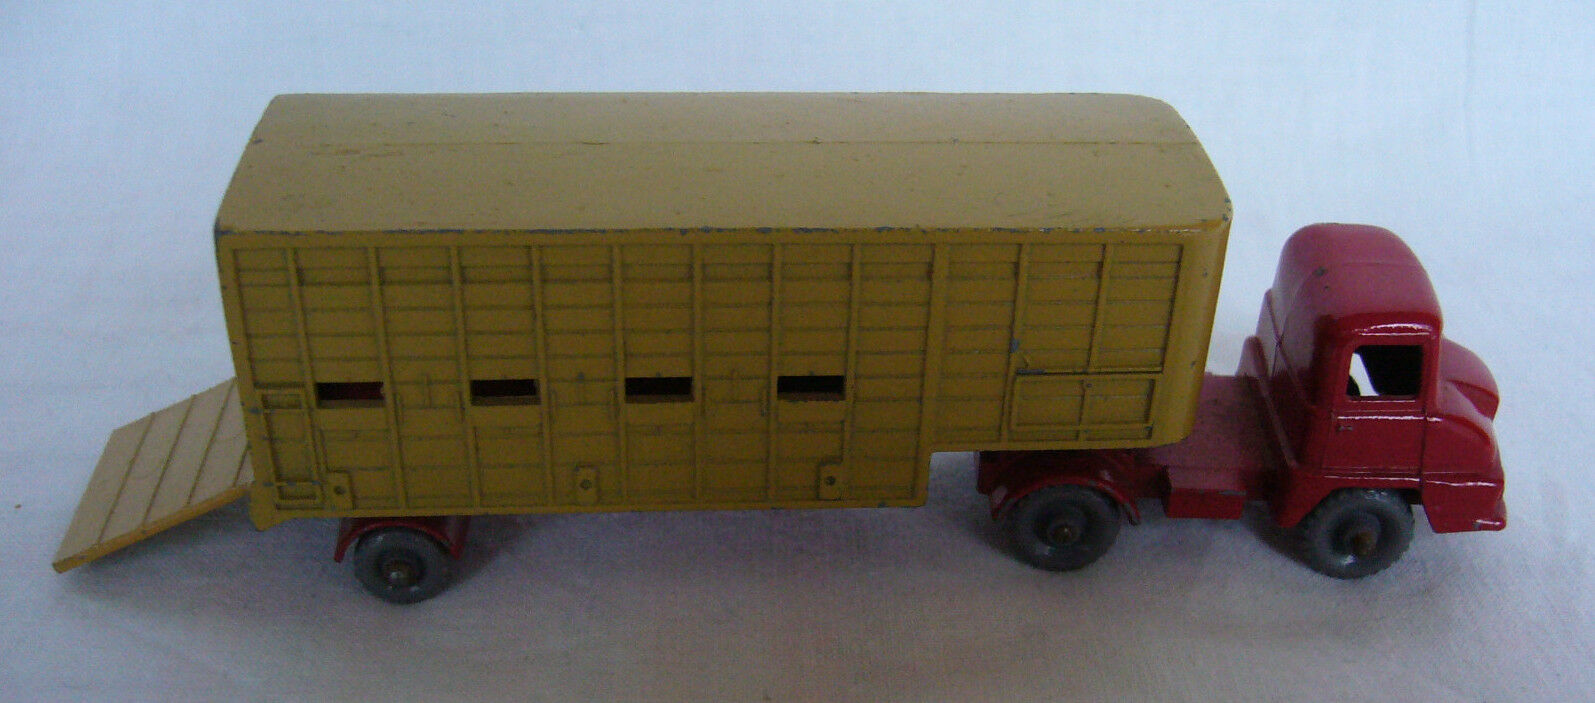 MATCHBOX-Major PACK no. 7 Jennings CATTLE TRUCK-Thames Trader